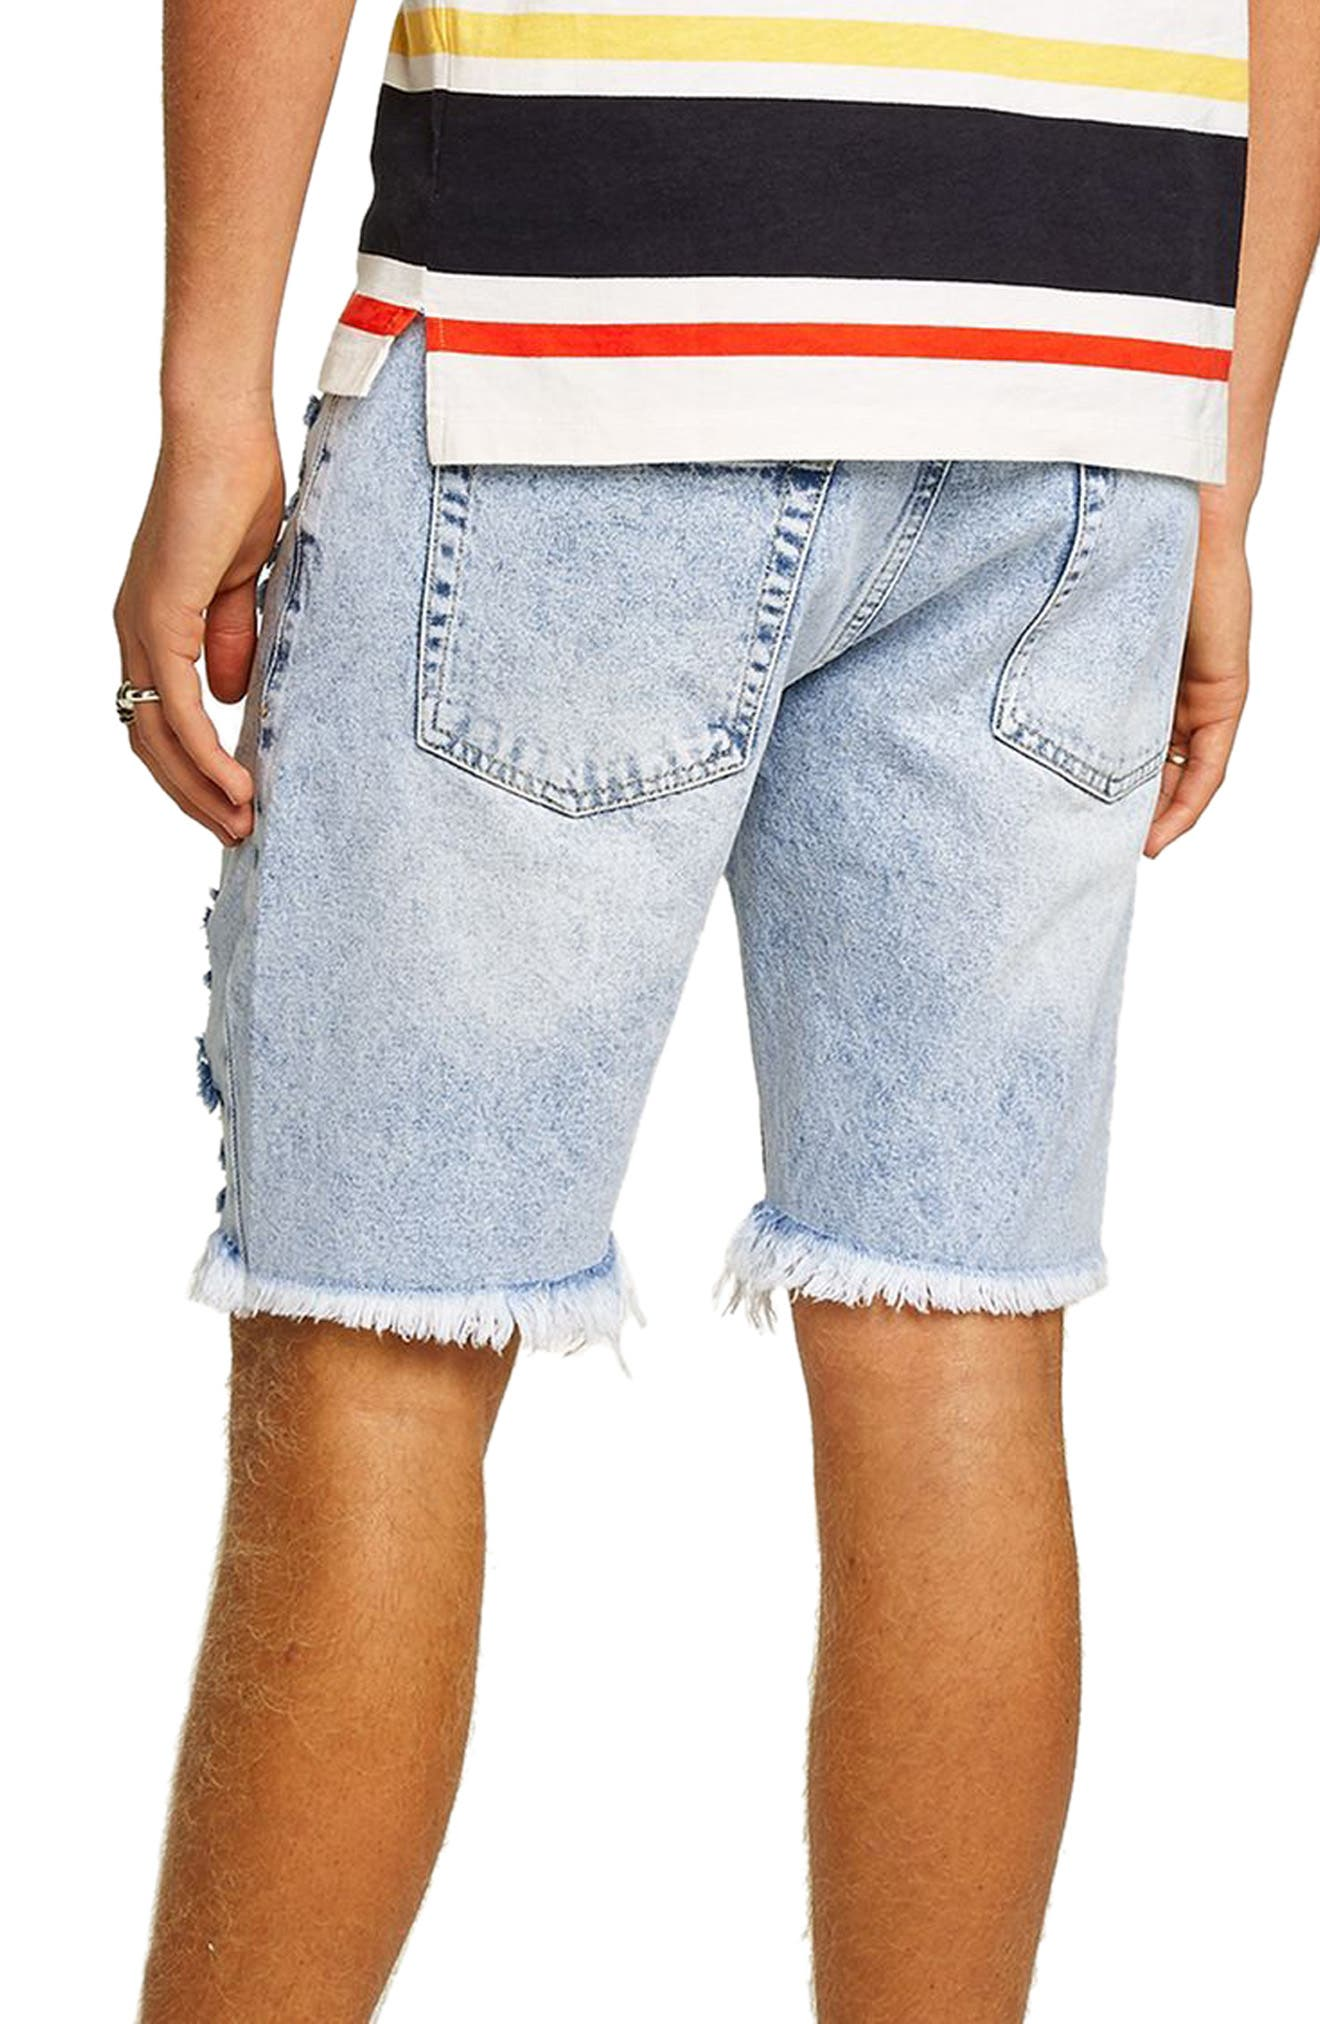 Slim Fit Ripped Denim Shorts,                             Alternate thumbnail 2, color,                             Light Blue